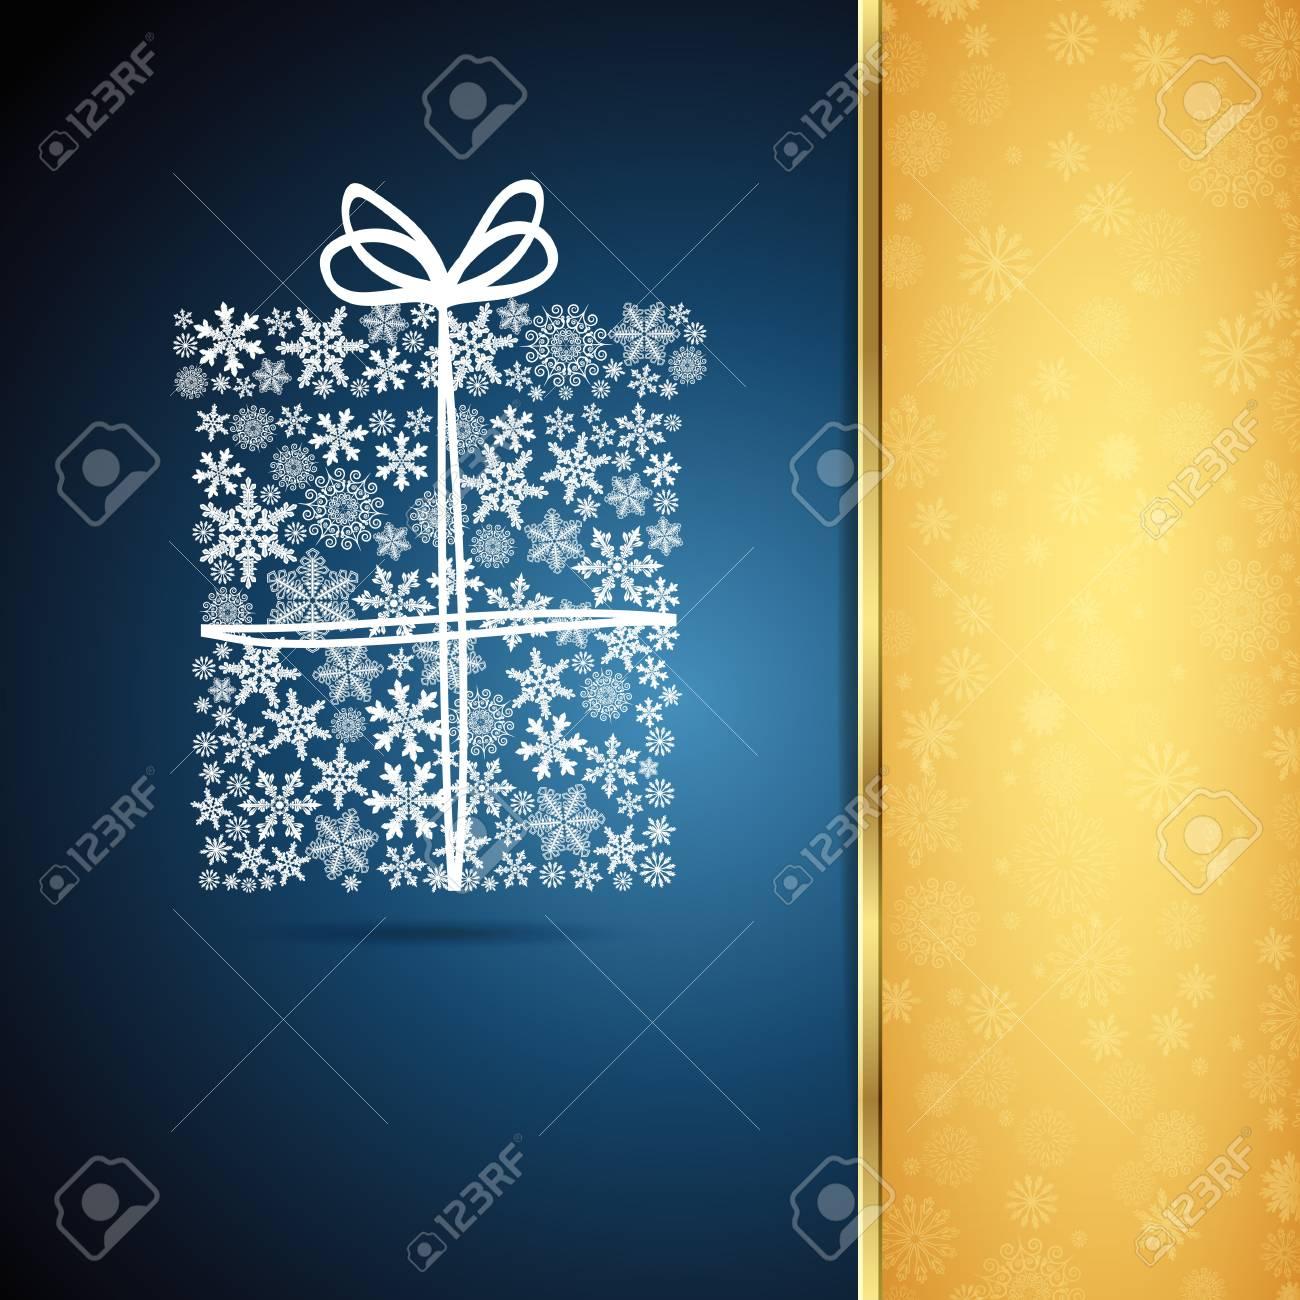 Christmas gift box, snowflake design background. Stock Vector - 16374022